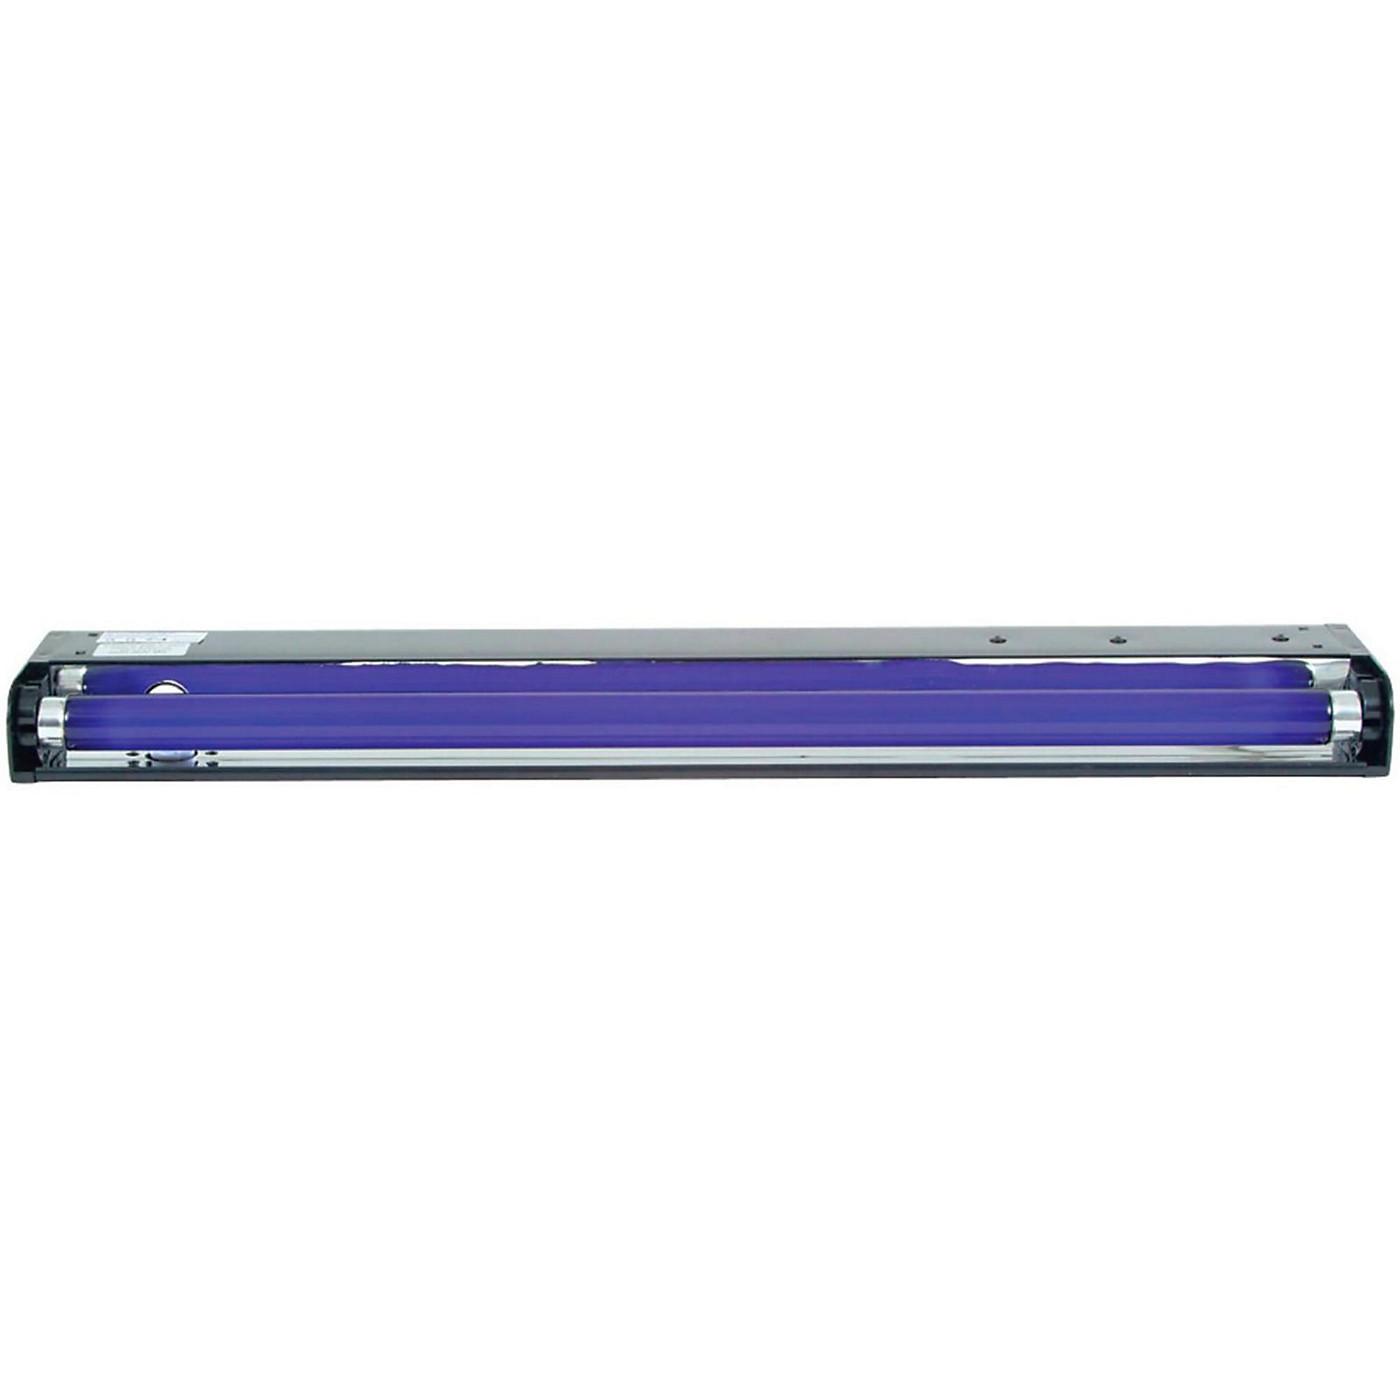 Eliminator Lighting Black-48 (E-124) Blacklight thumbnail